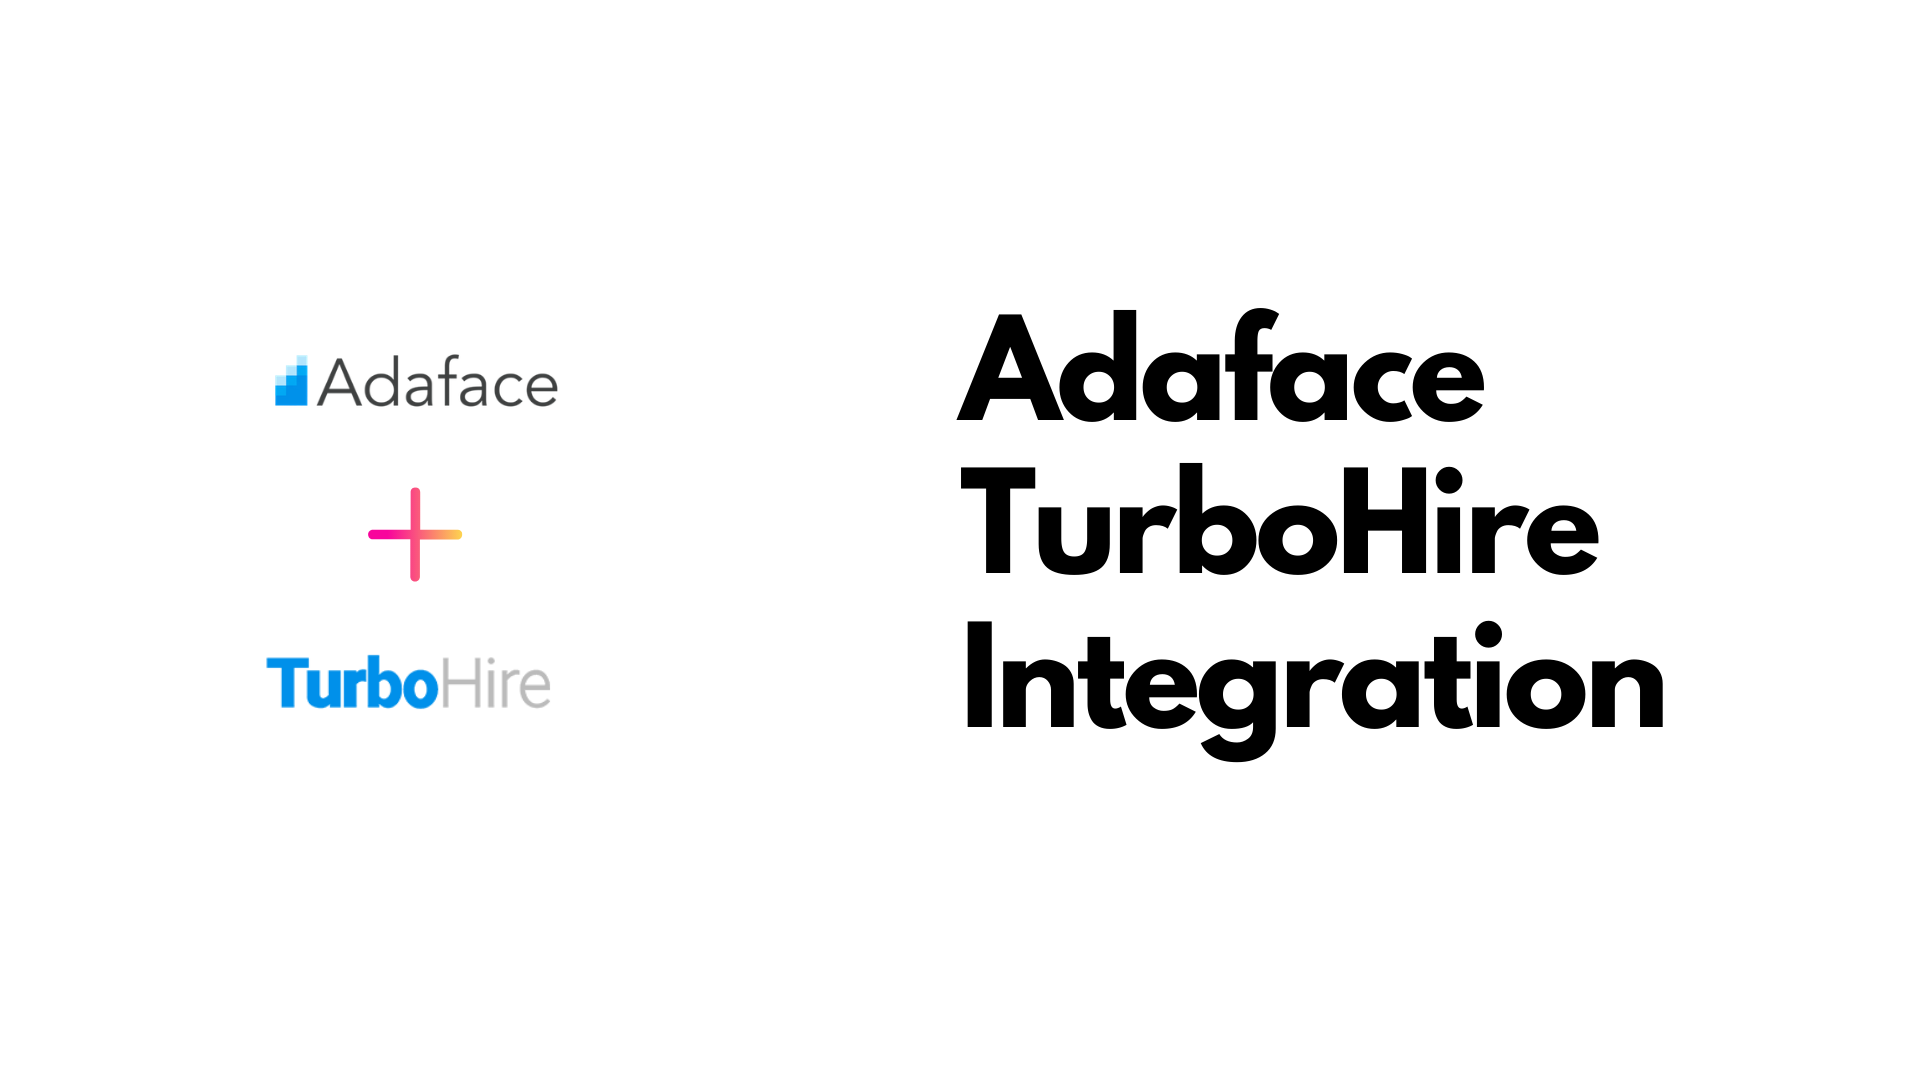 Adaface TurboHire Integration image